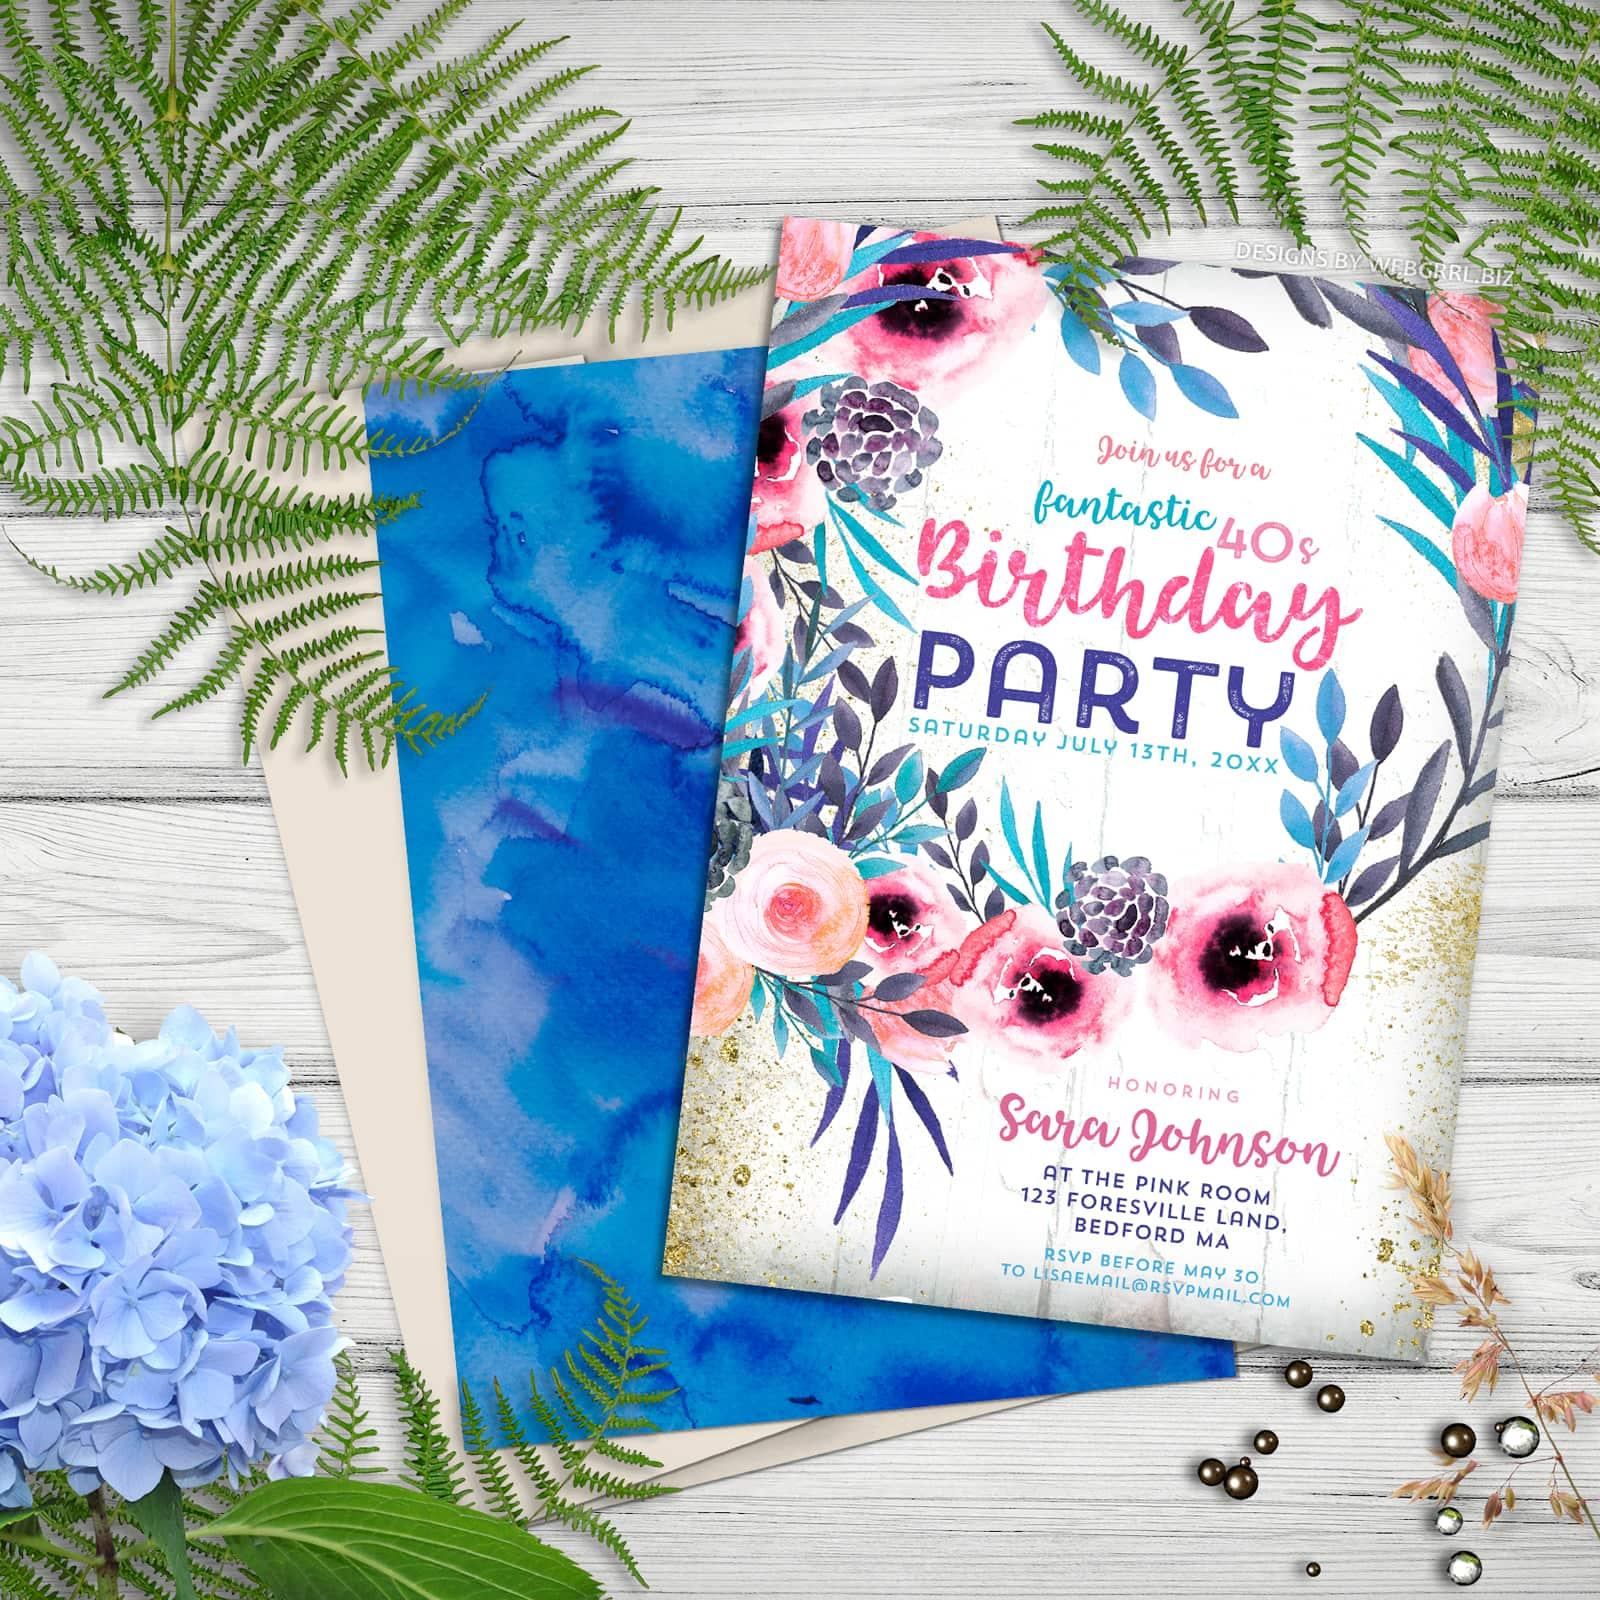 Blue Pink Floral Wreath | Rustic Birthday Party Invitation by Webgrrl